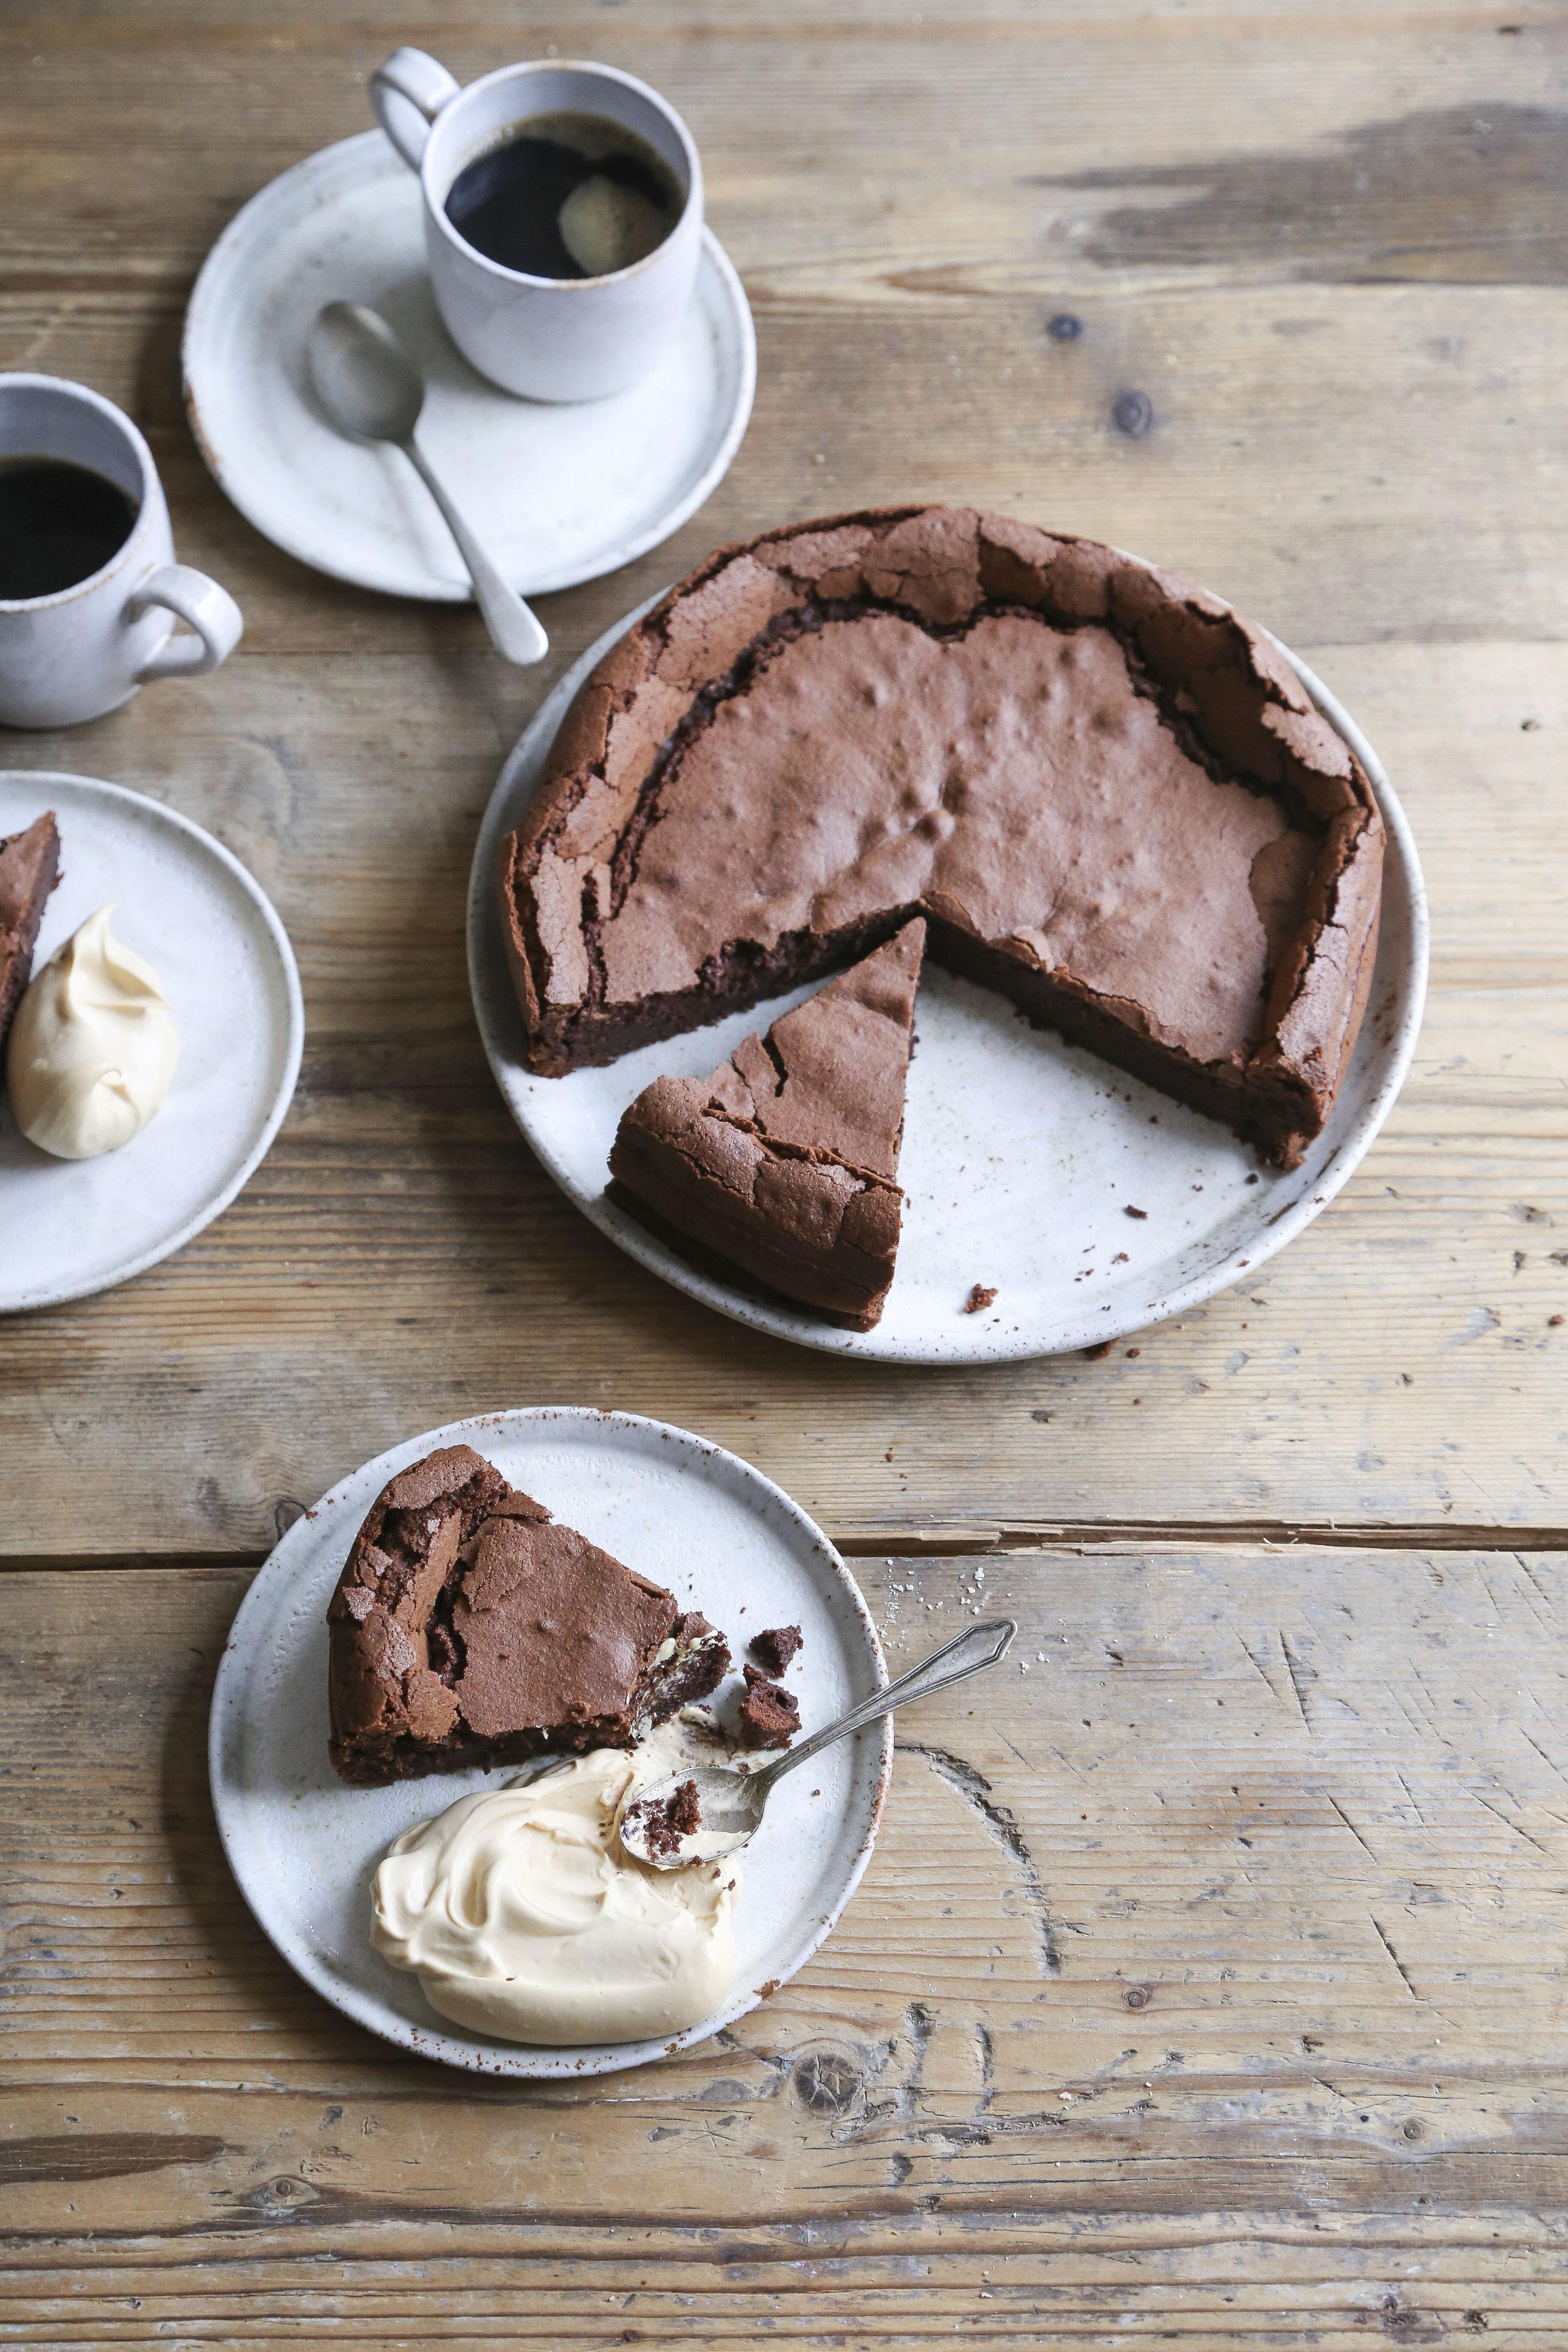 Flourless Chocolate Cake With Salted Caramel Cream The Boy Who Bakes